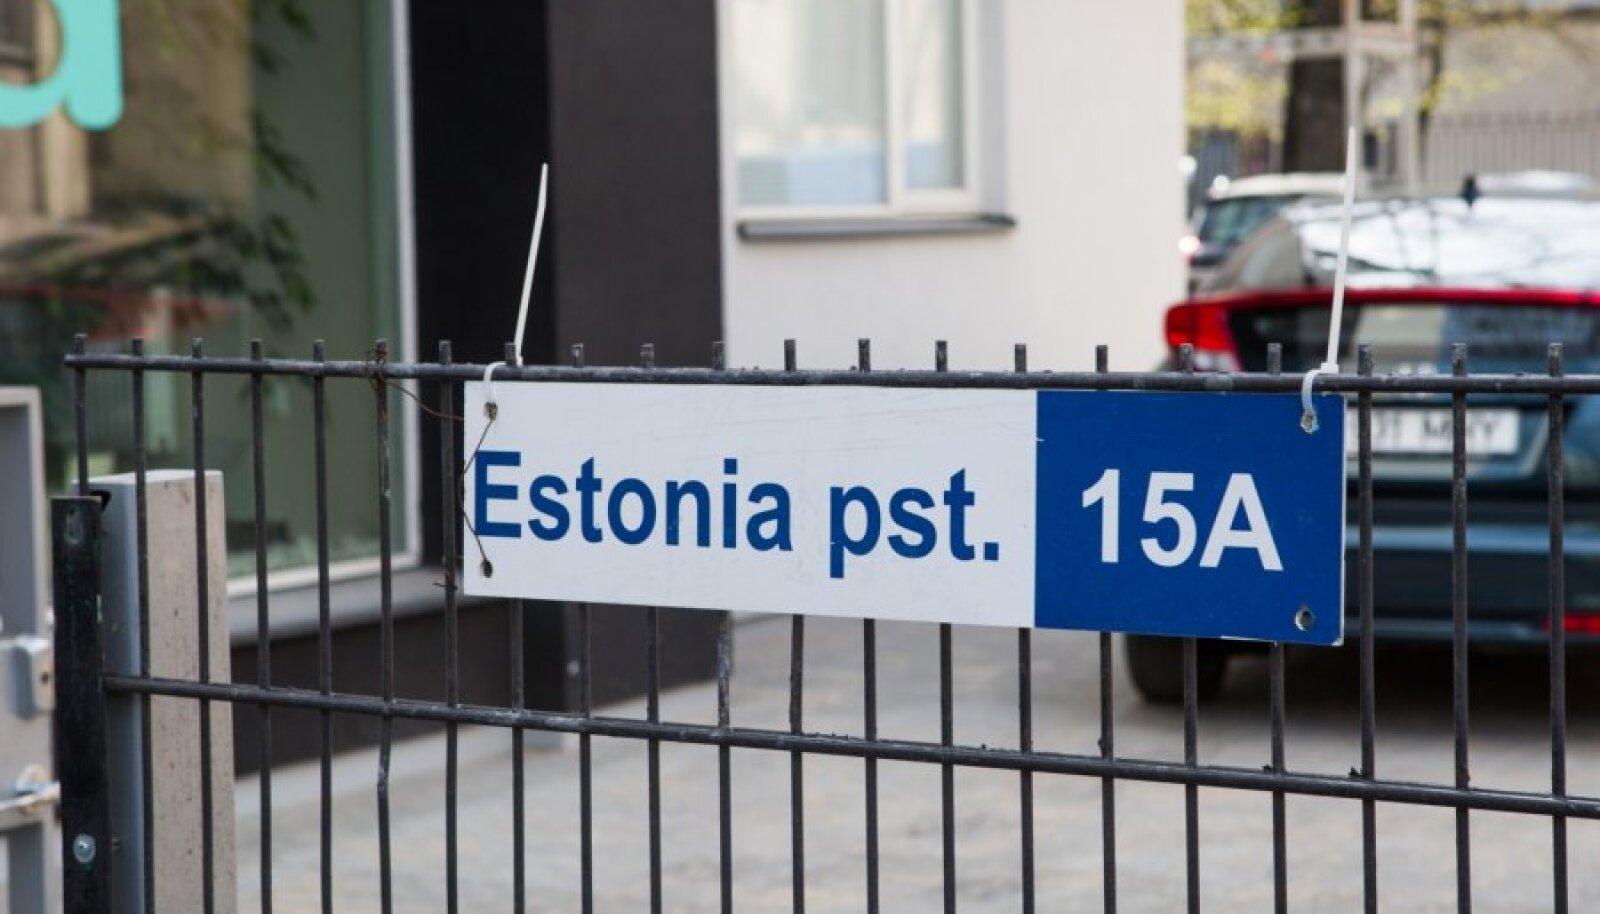 Estonia pst 15a